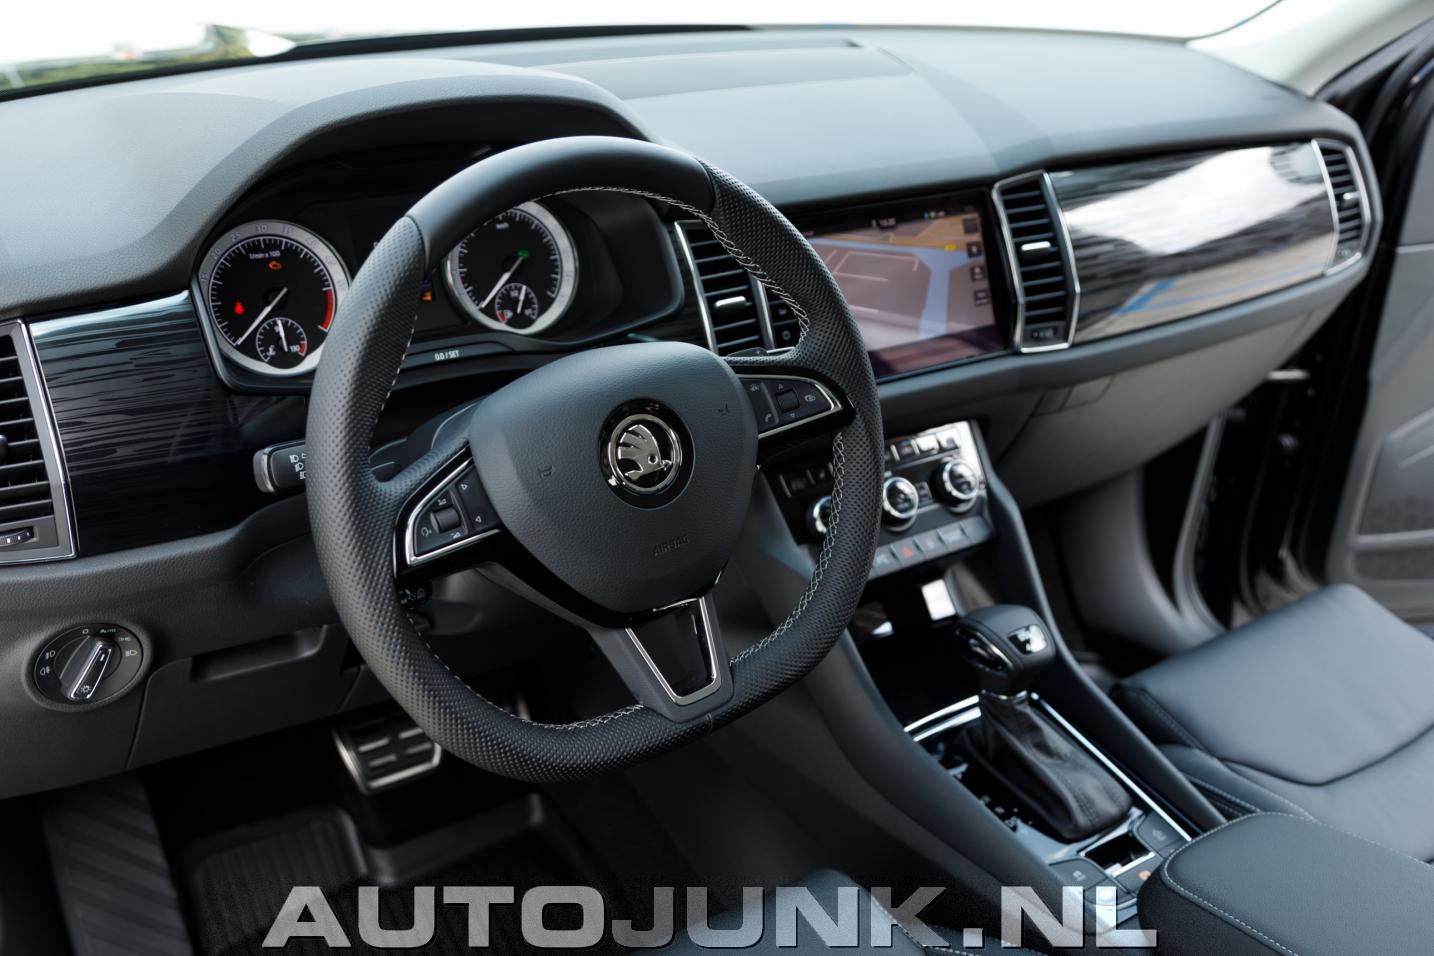 Skoda kodiaq 4x4 2 0 tdi 190pk taxi foto 39 s for Auto interieur reinigen eindhoven